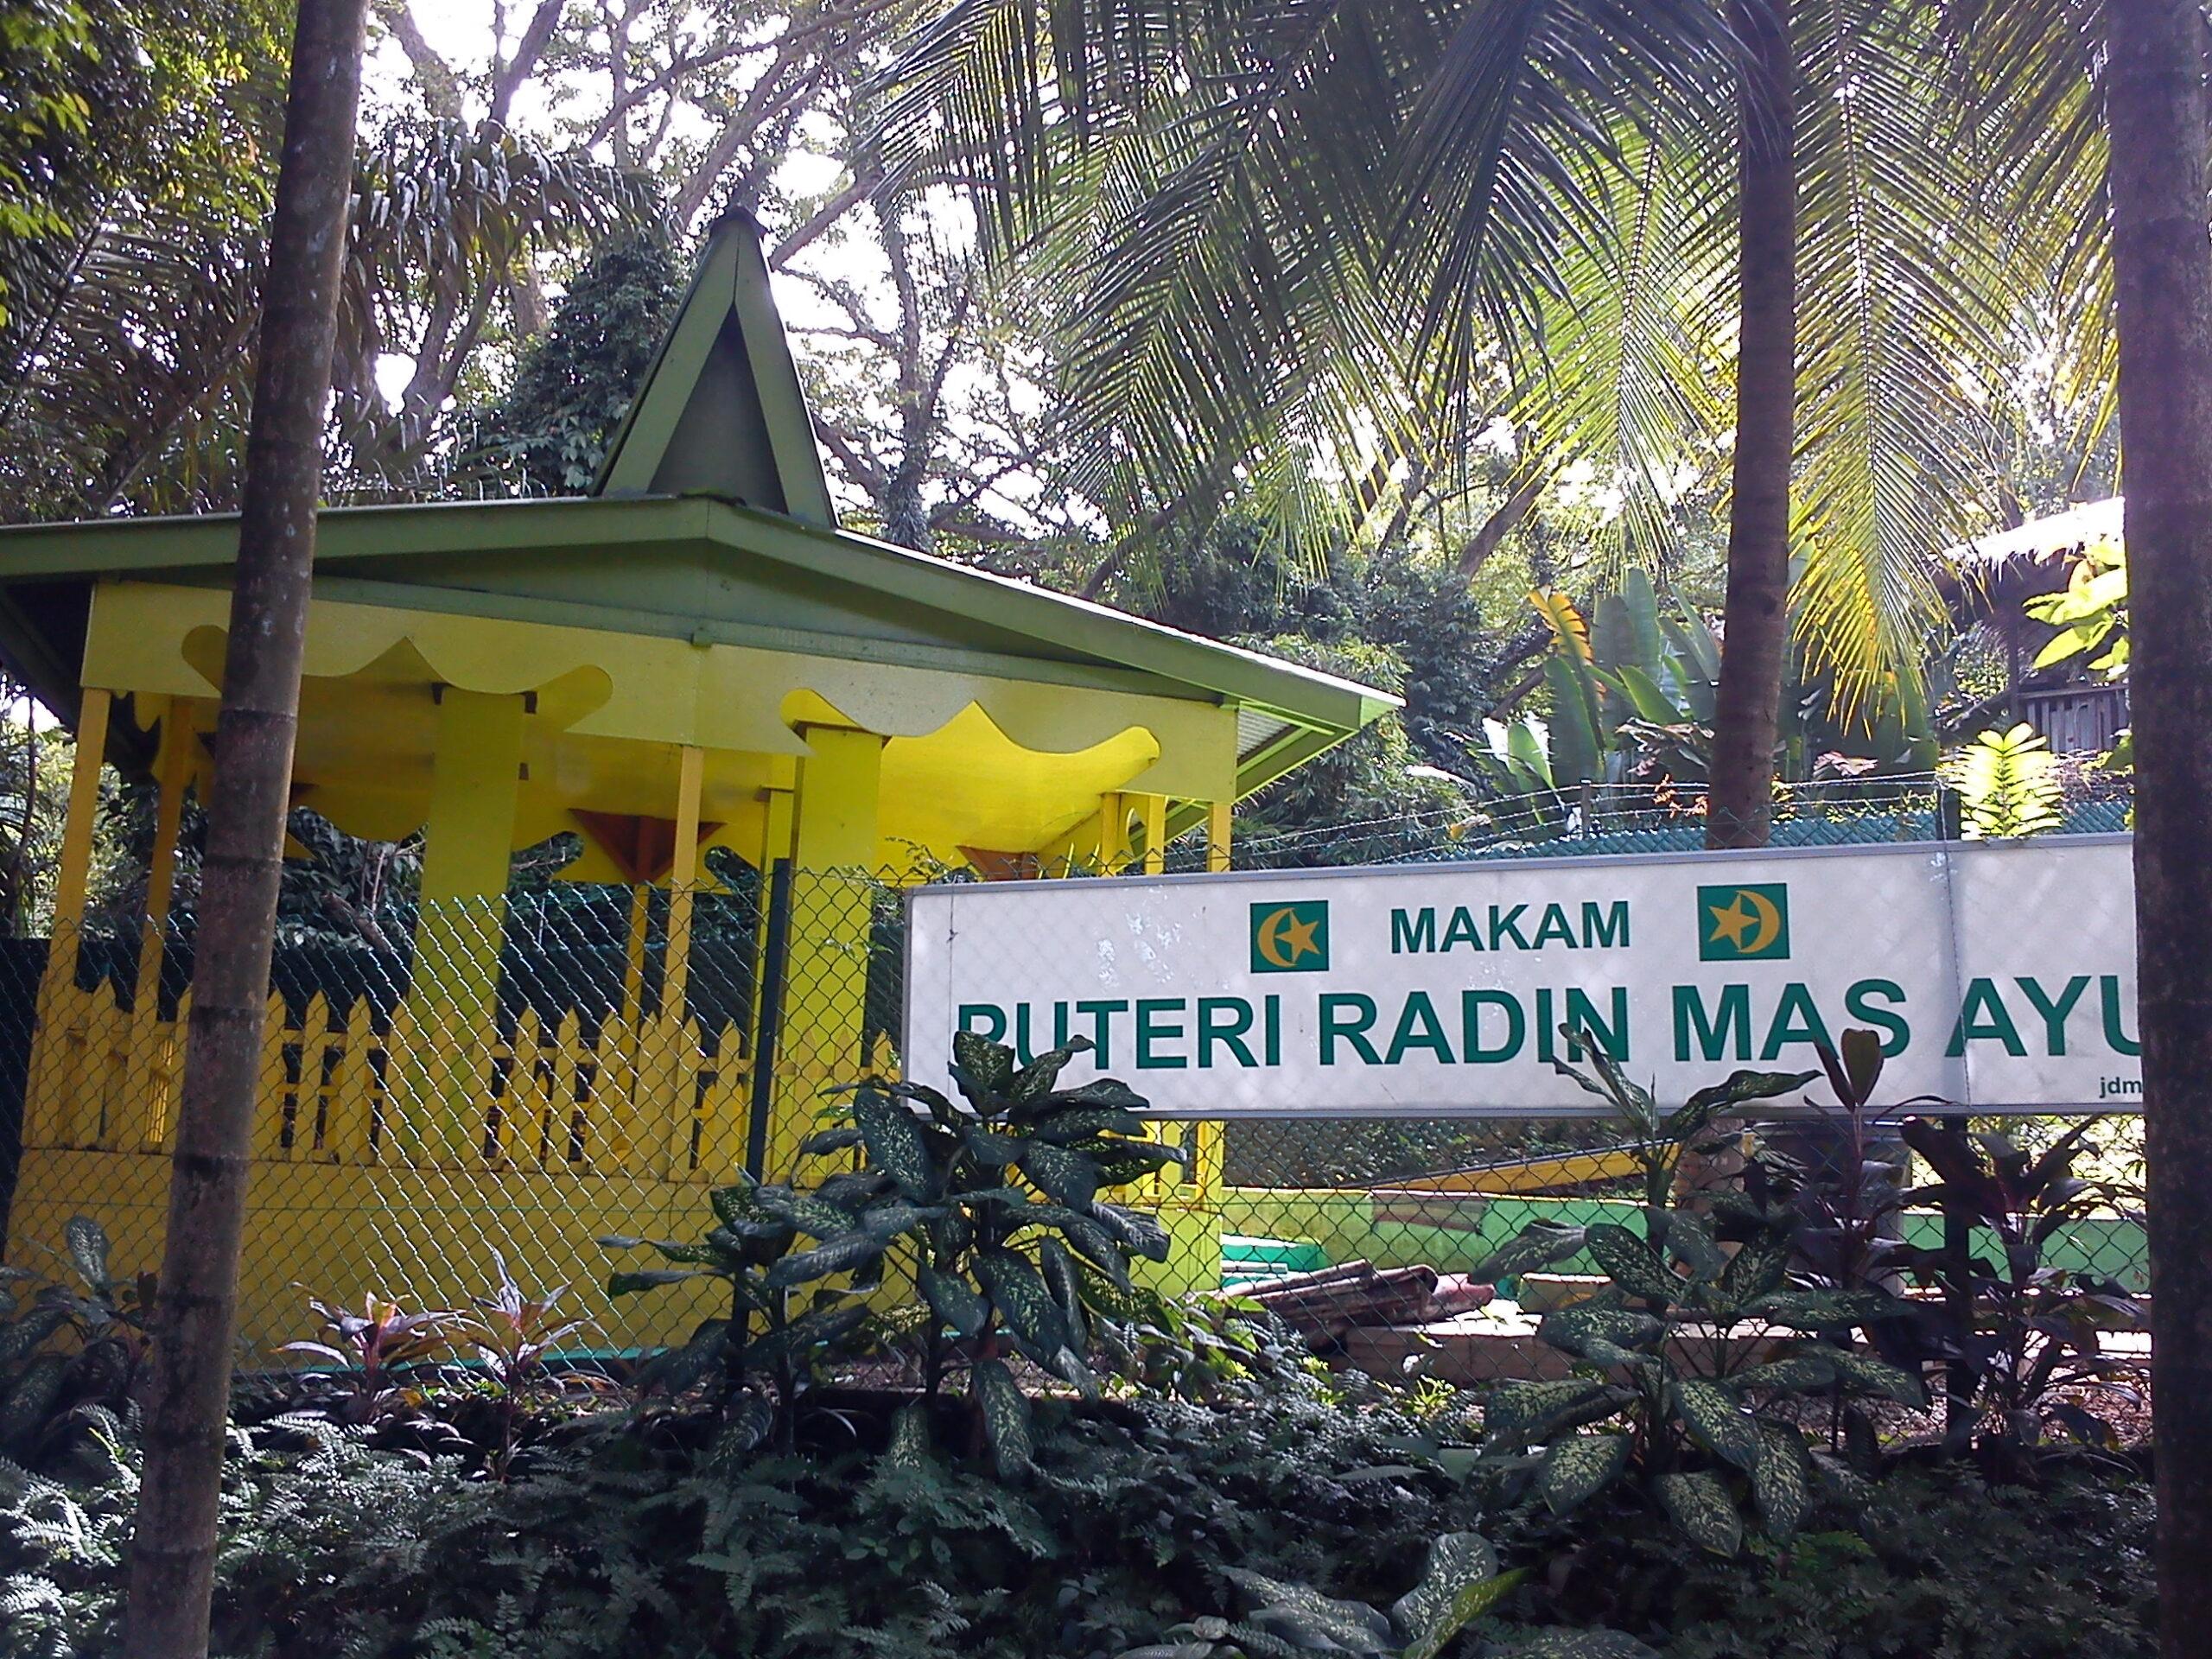 Radin Mas Ayu Shrine